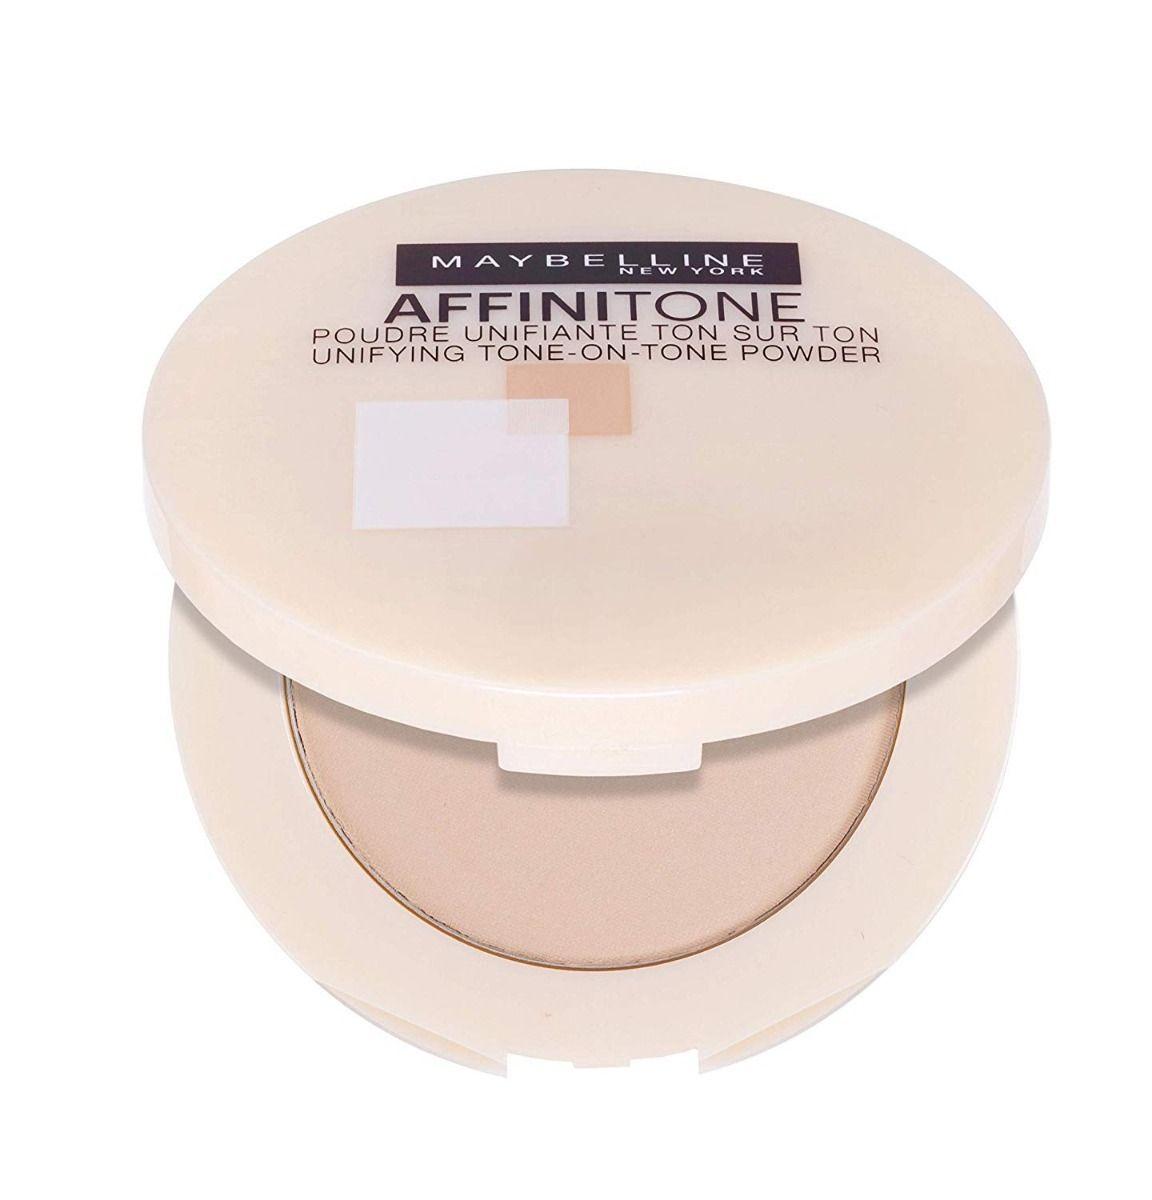 Maybelline Affinitone Powder 17 Rose Beige